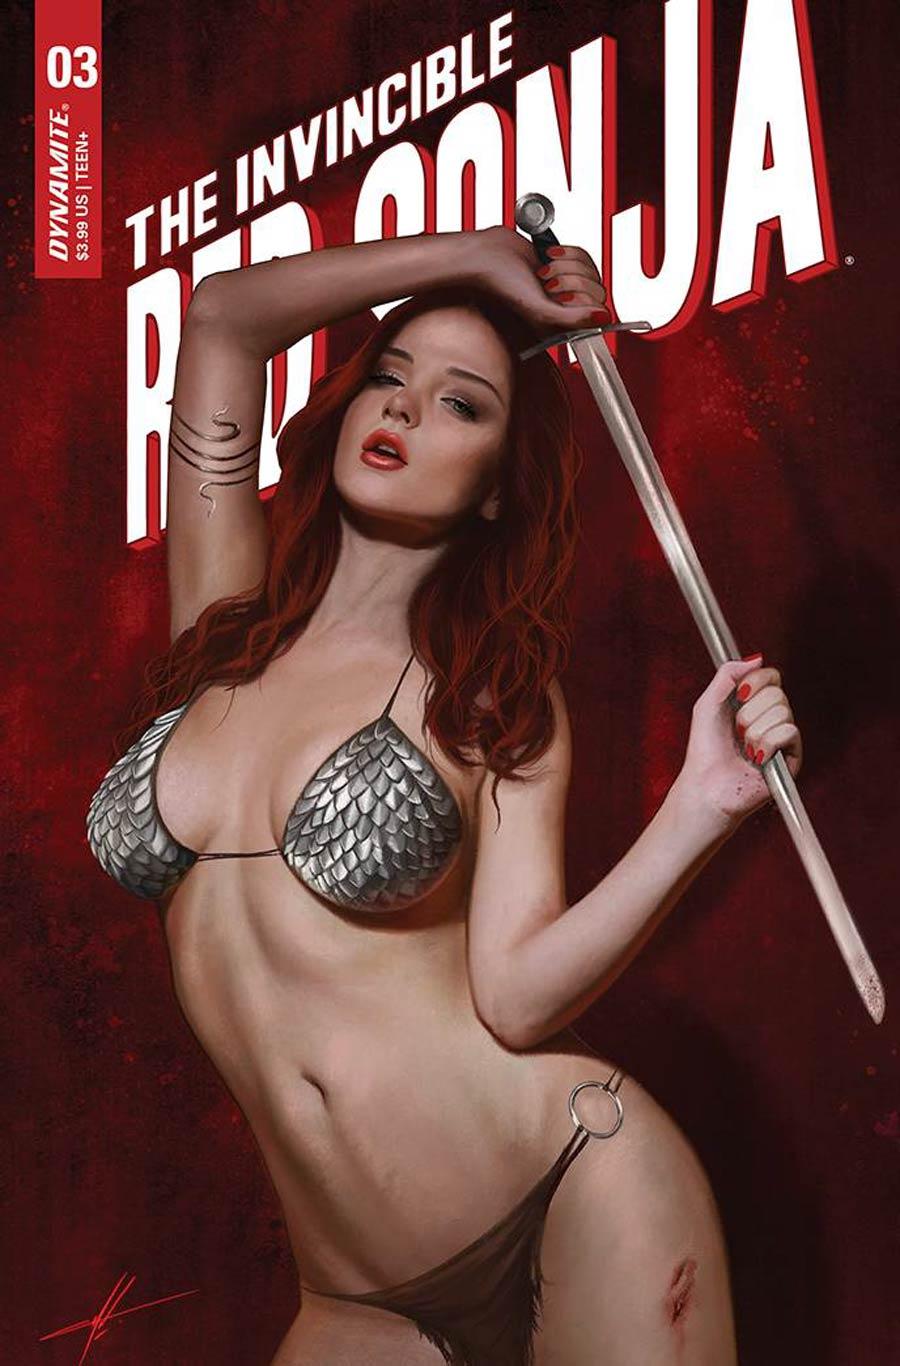 Invincible Red Sonja #3 Cover F Incentive Carla Cohen Variant Cover